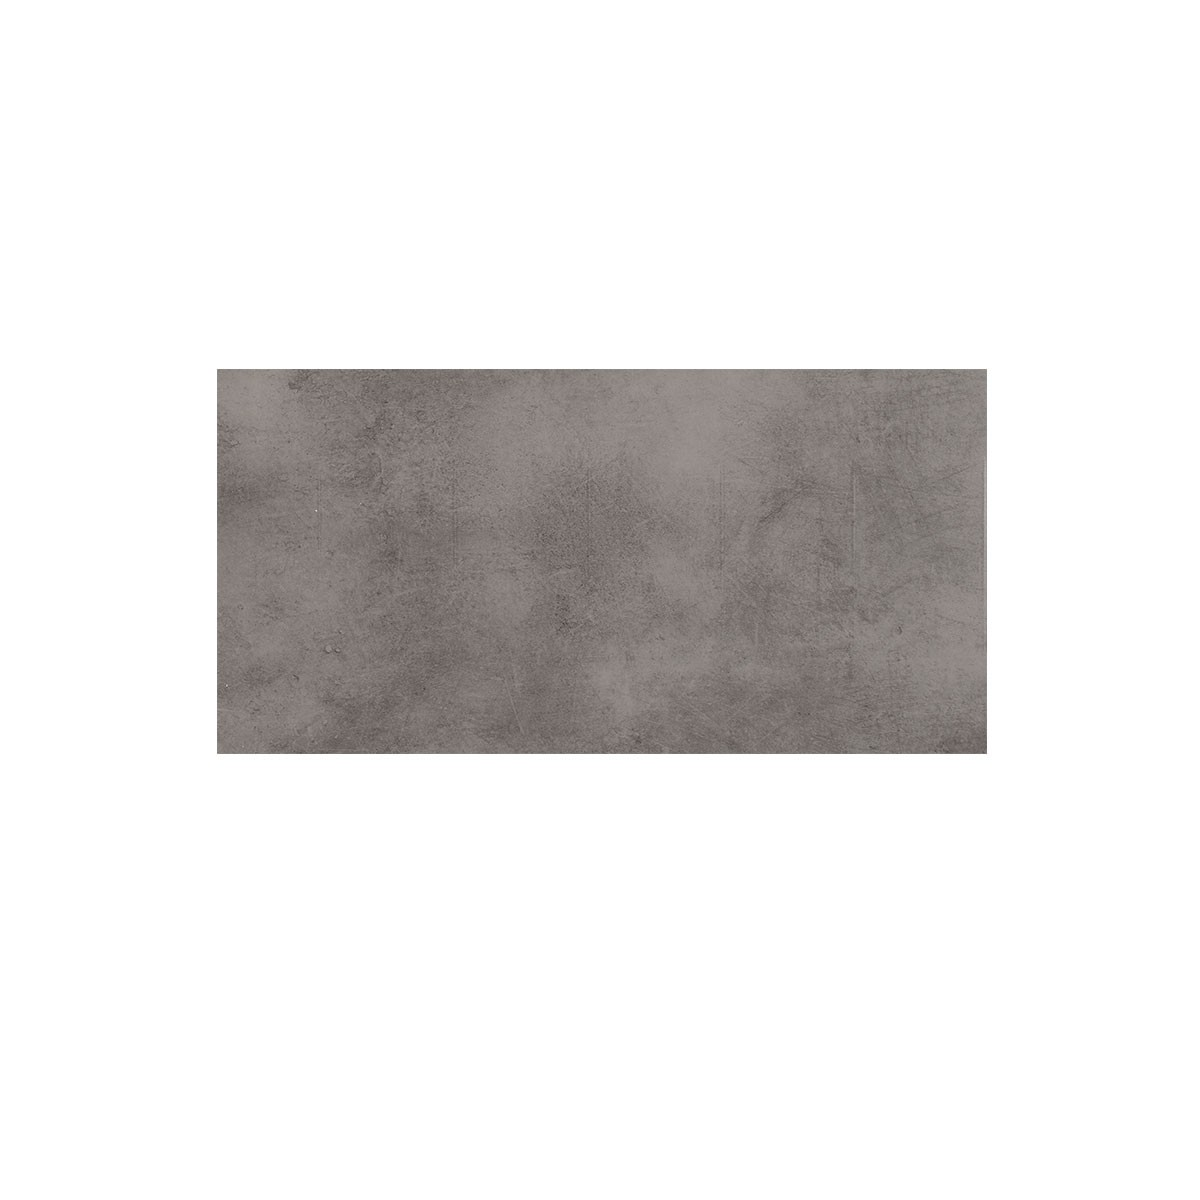 DECORAPORT NWS Wall Panel, Luxor Medium, 4'' x6'' (NLS-03) (Sample)